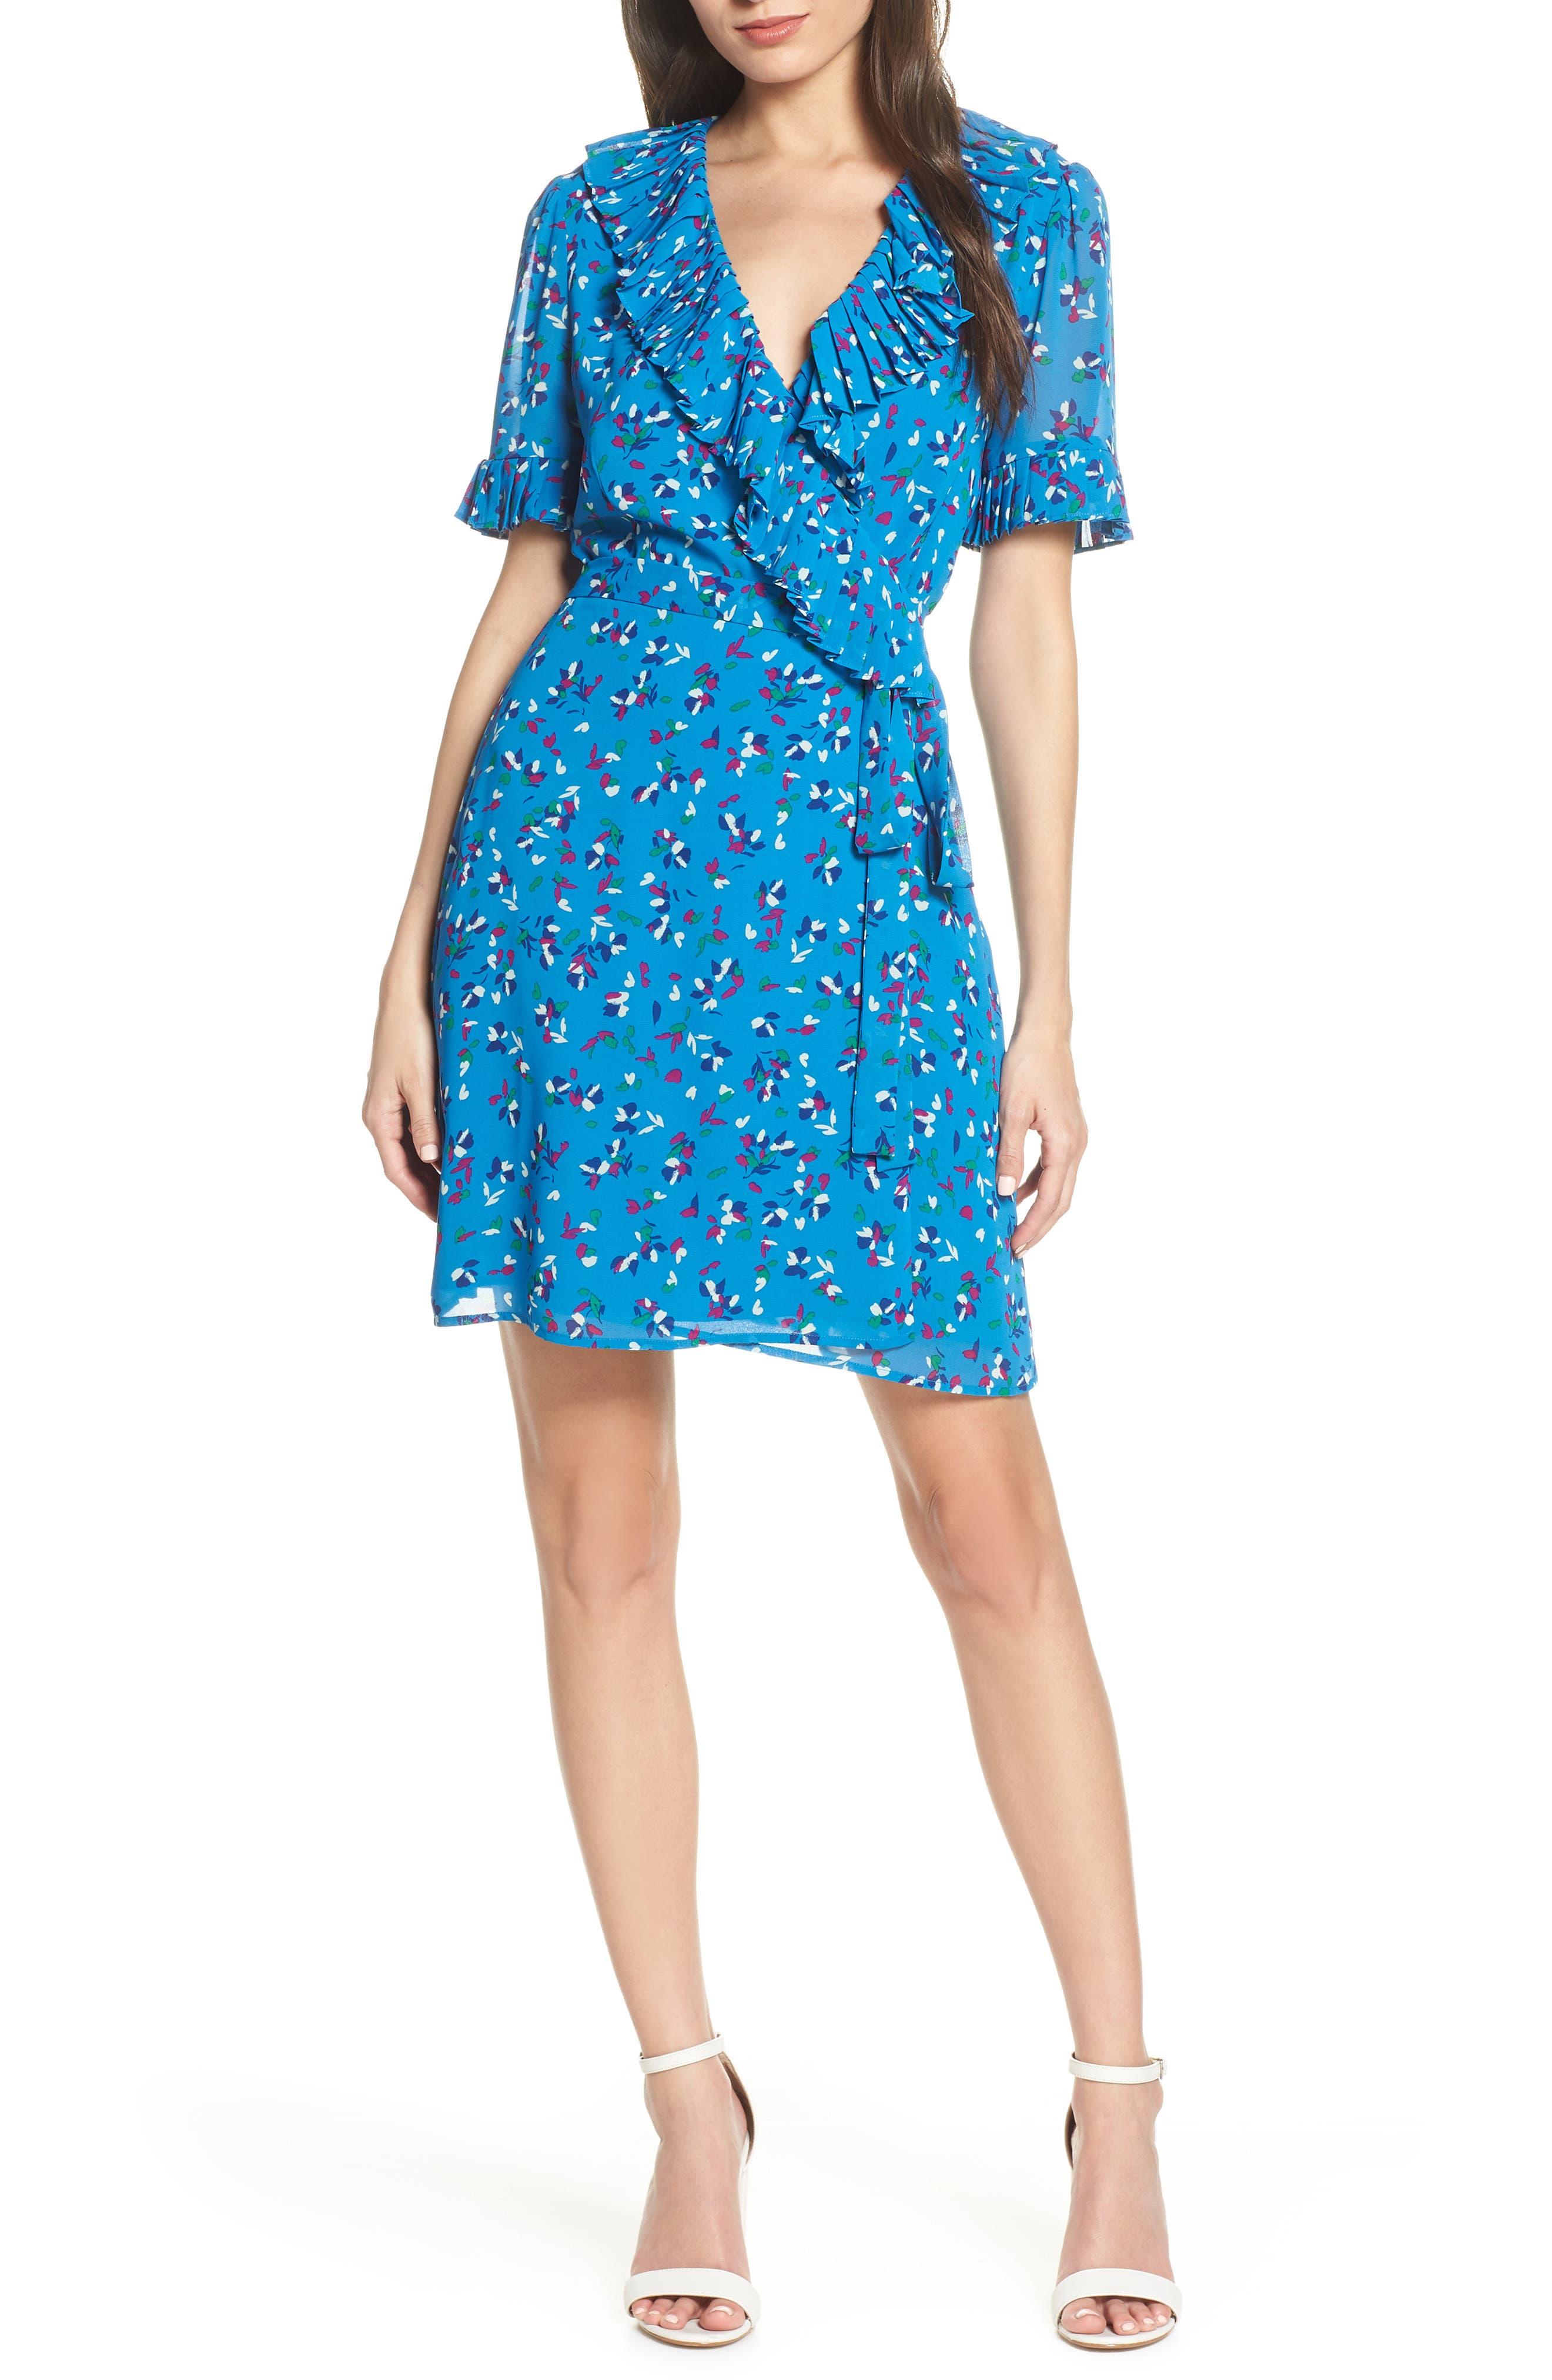 CHARLES HENRY Pleat Neck Wrap Dress, Main, color, BLUE FLORAL DITZY